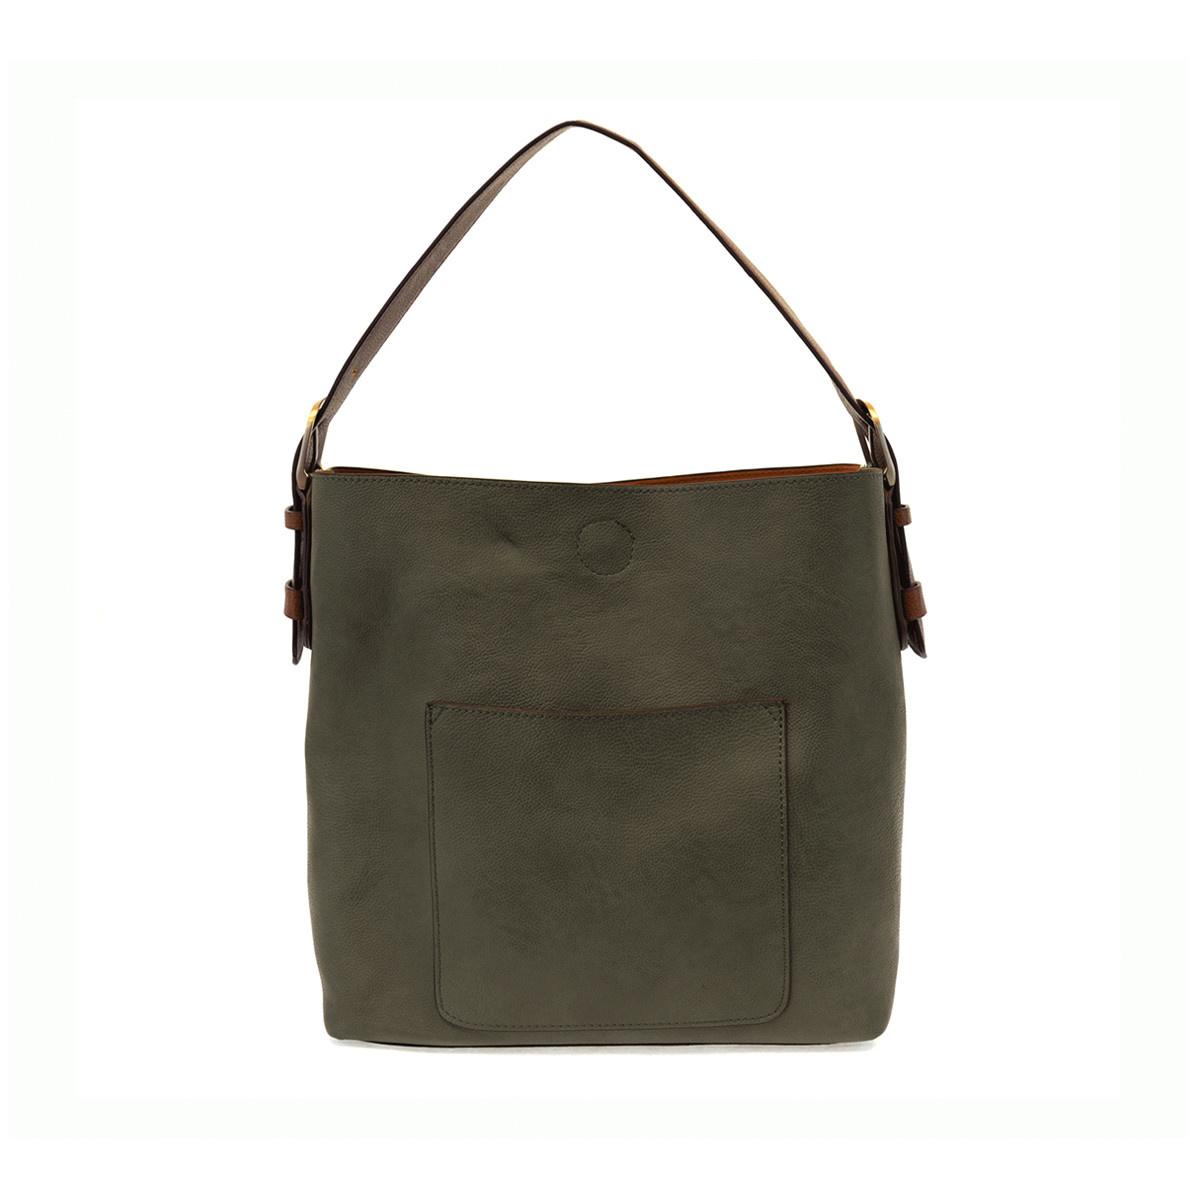 Joy Susan Joy Susan Classic Hobo Handbag Dark Olive